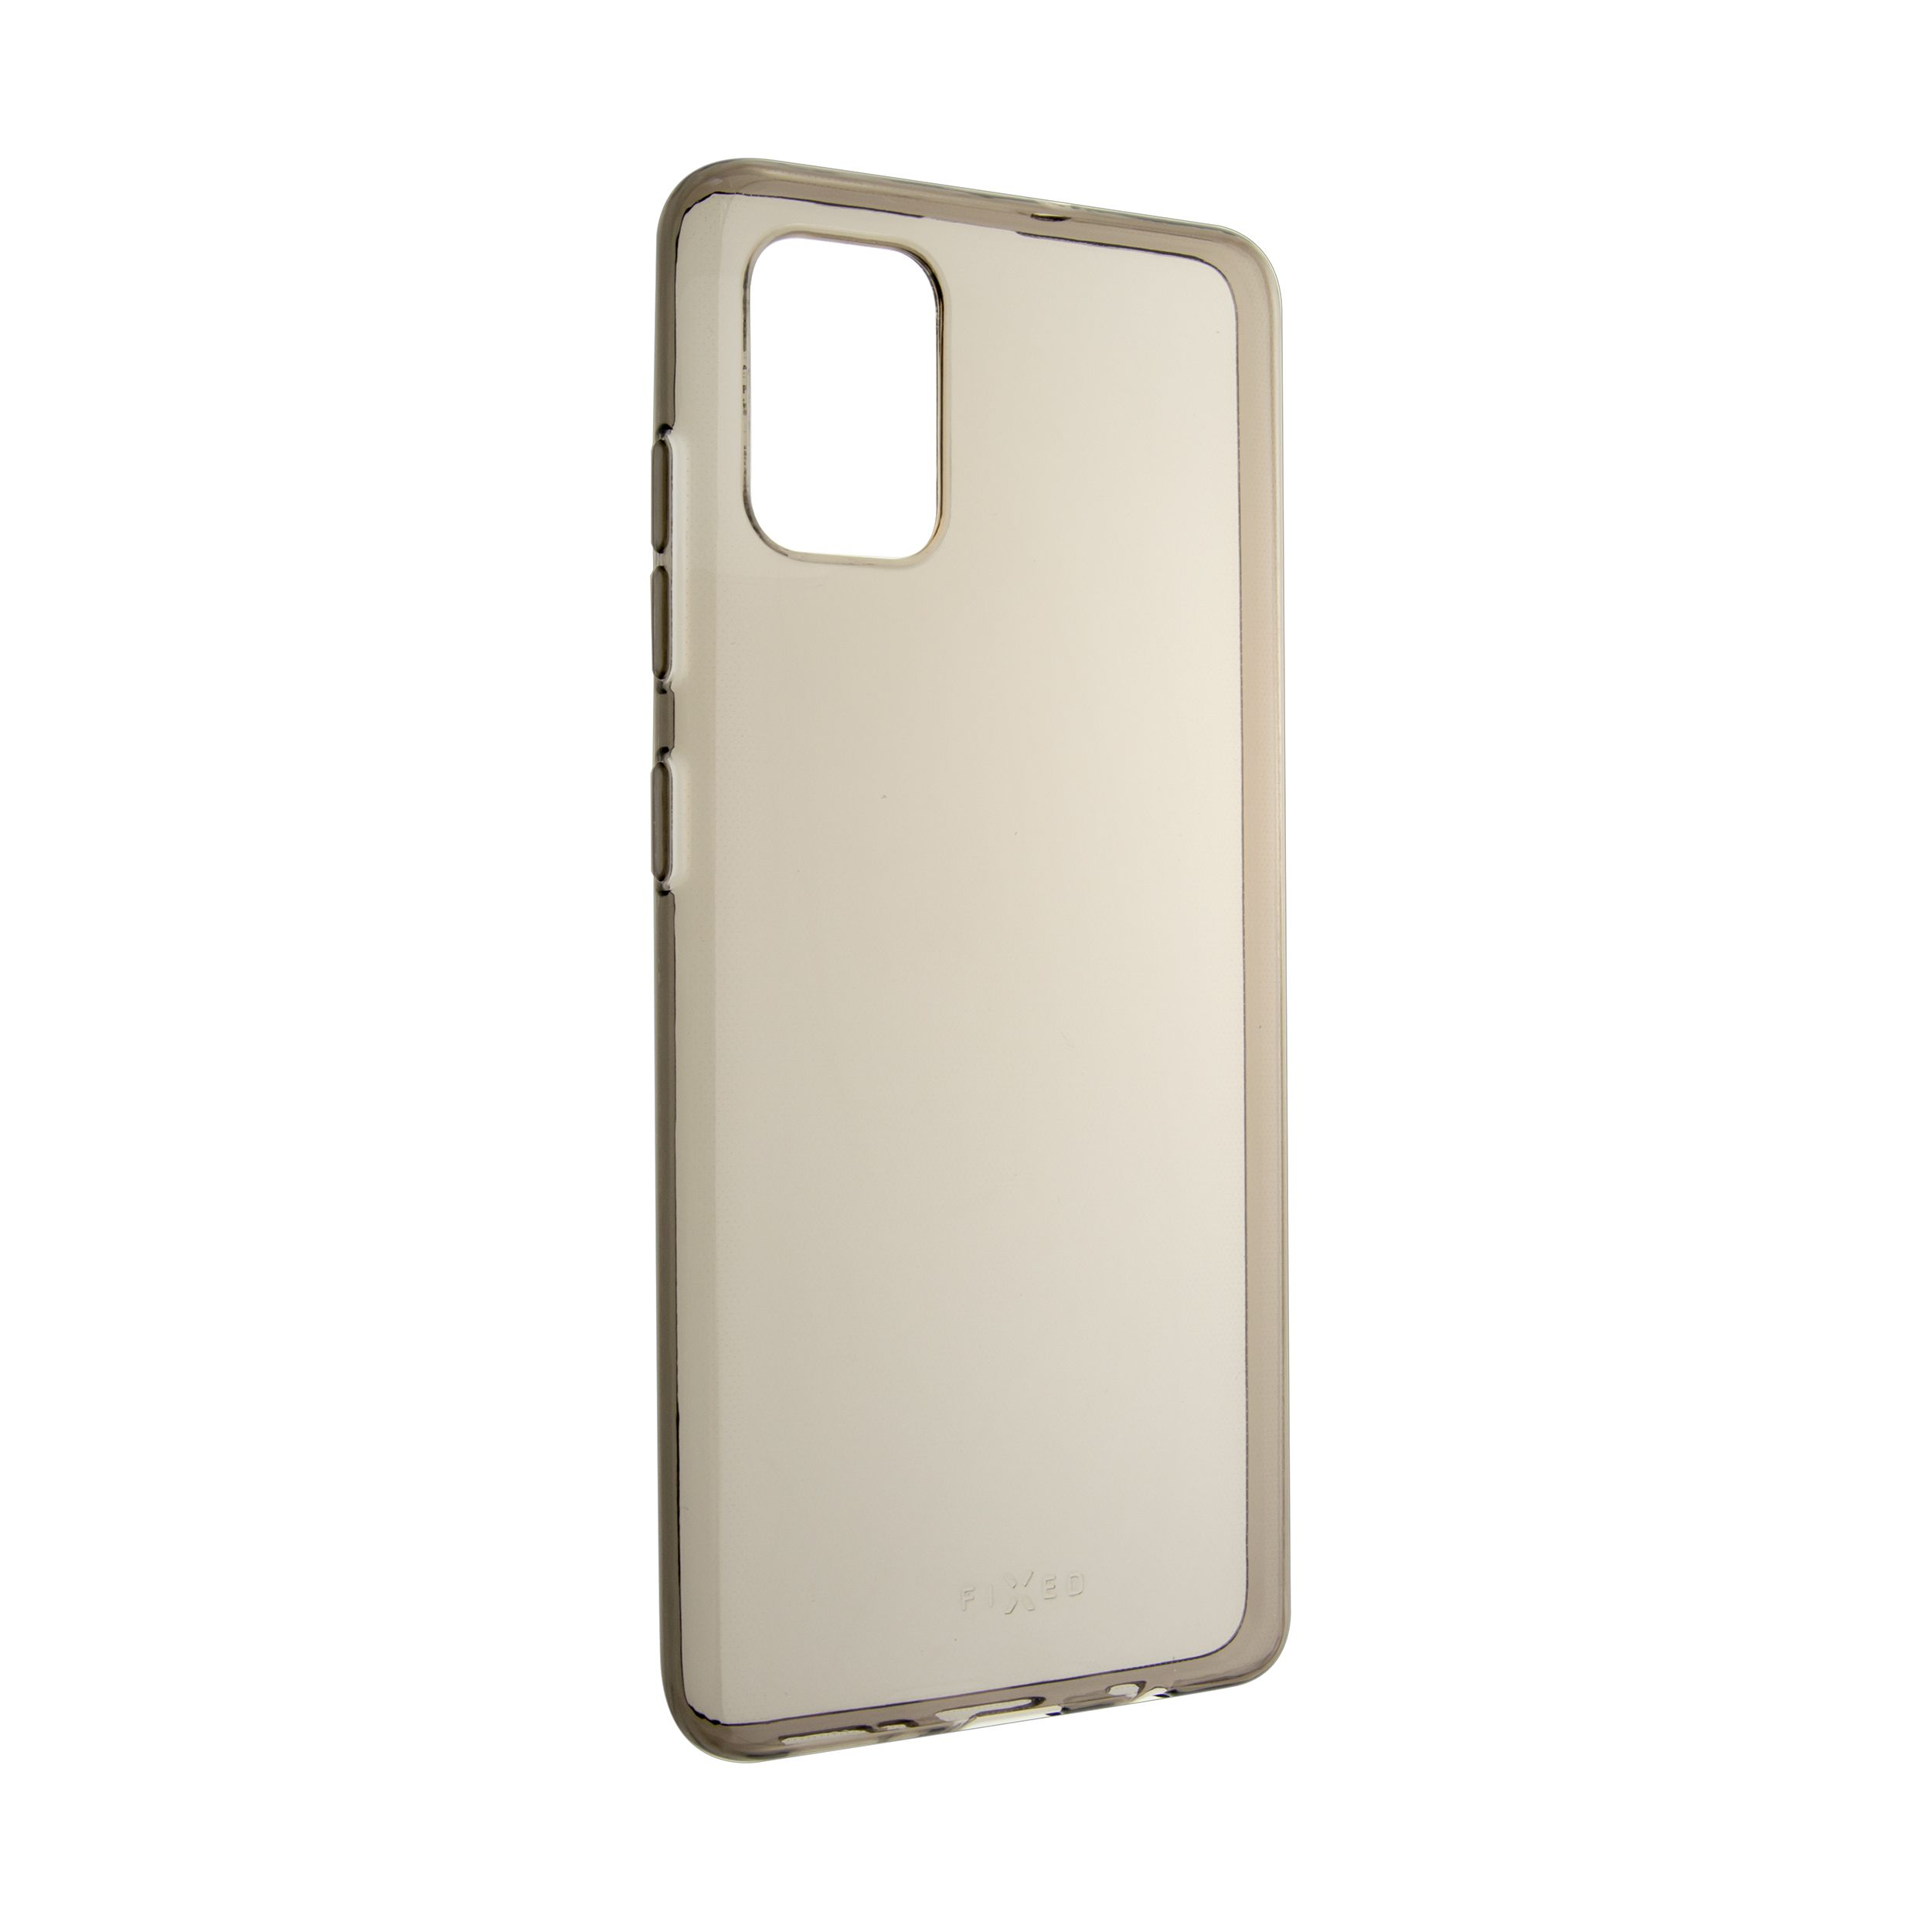 TPU gelové pouzdro FIXED Slim pro Samsung Galaxy A51, 0,6 mm, kouřové